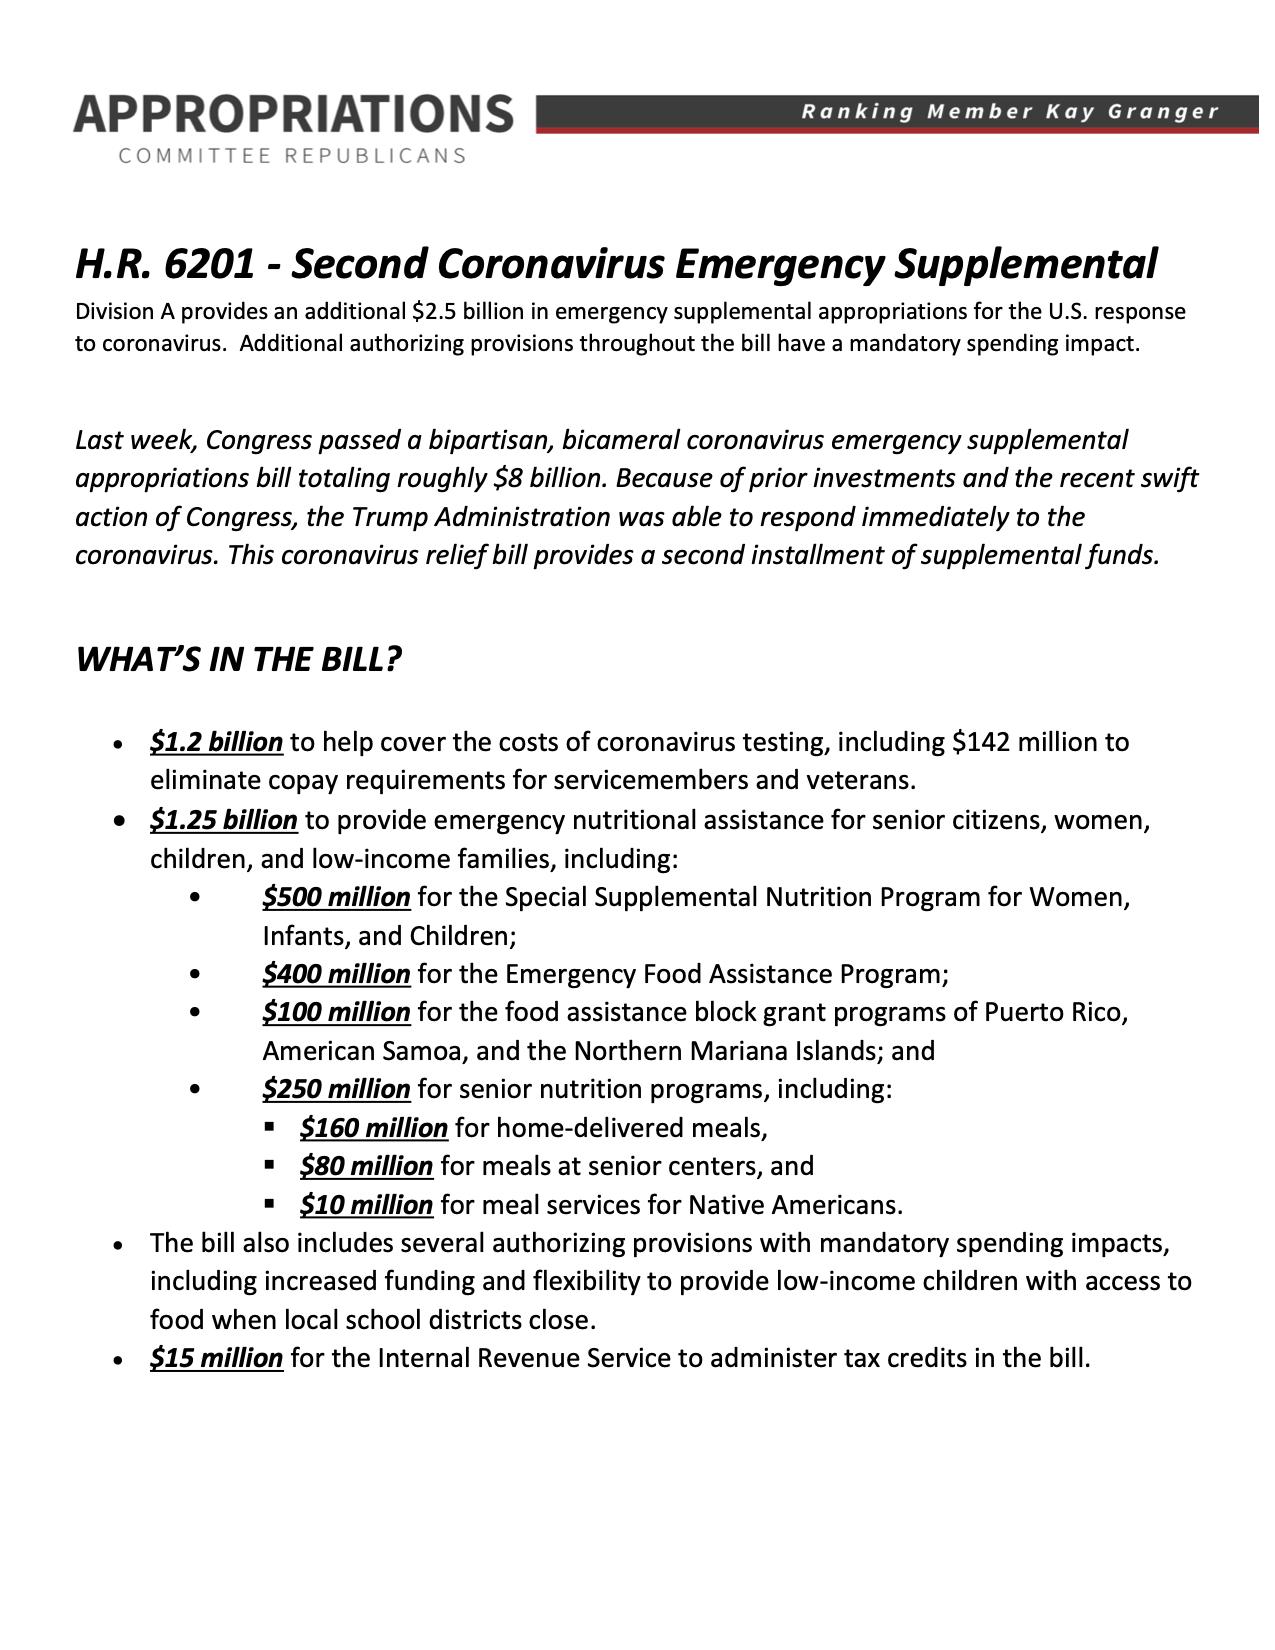 House Leads on Coronavirus Response | Congressman Steve Scalise